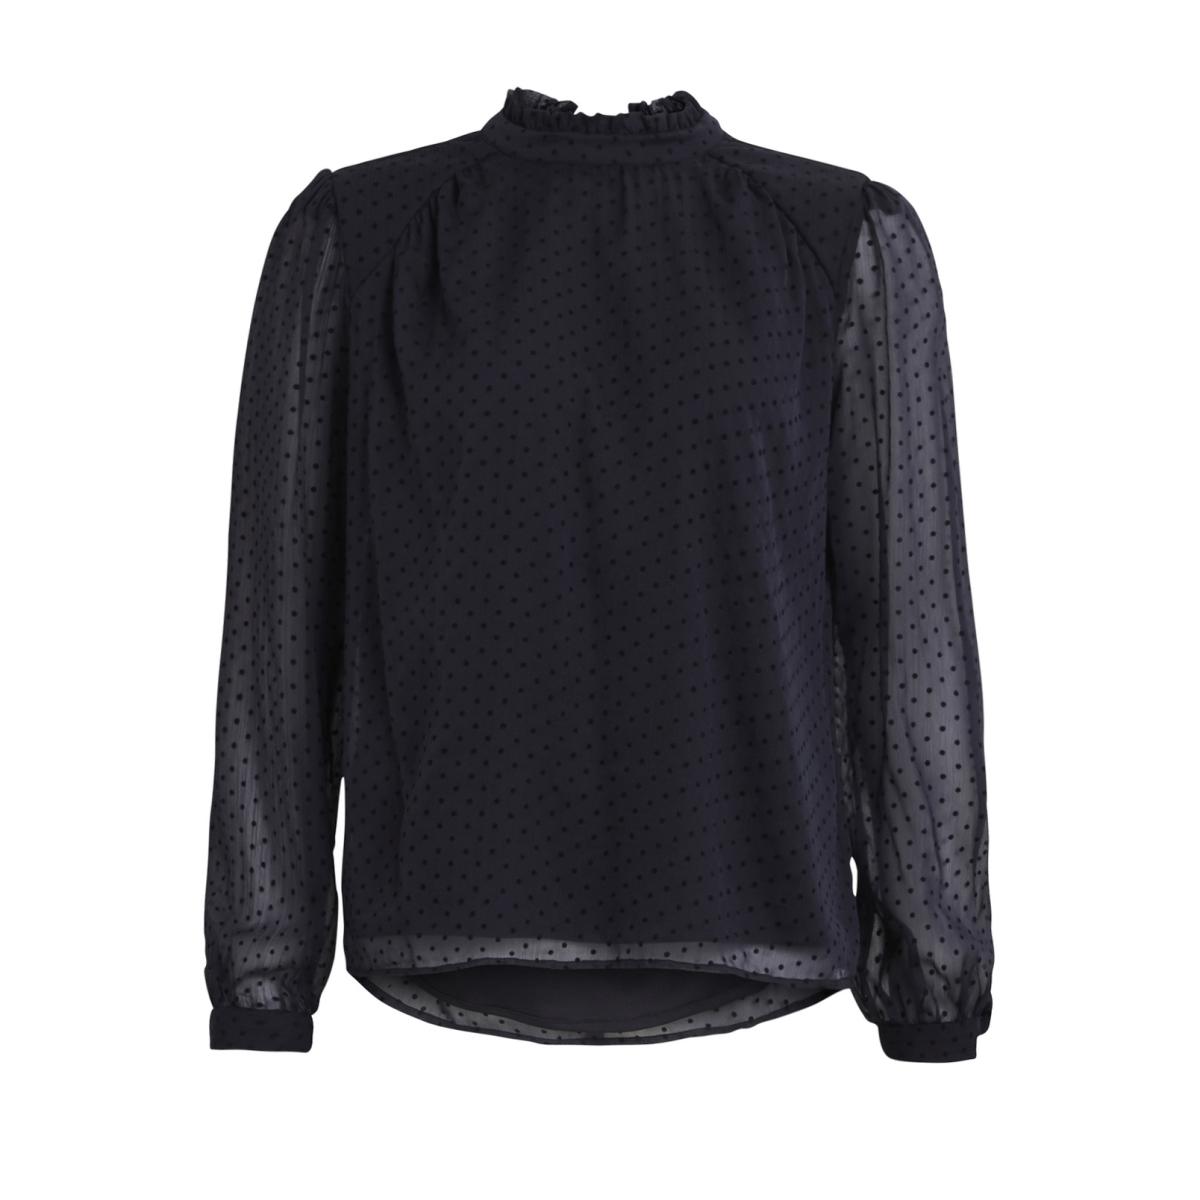 viamo l/s top 14044554 vila blouse dark navy